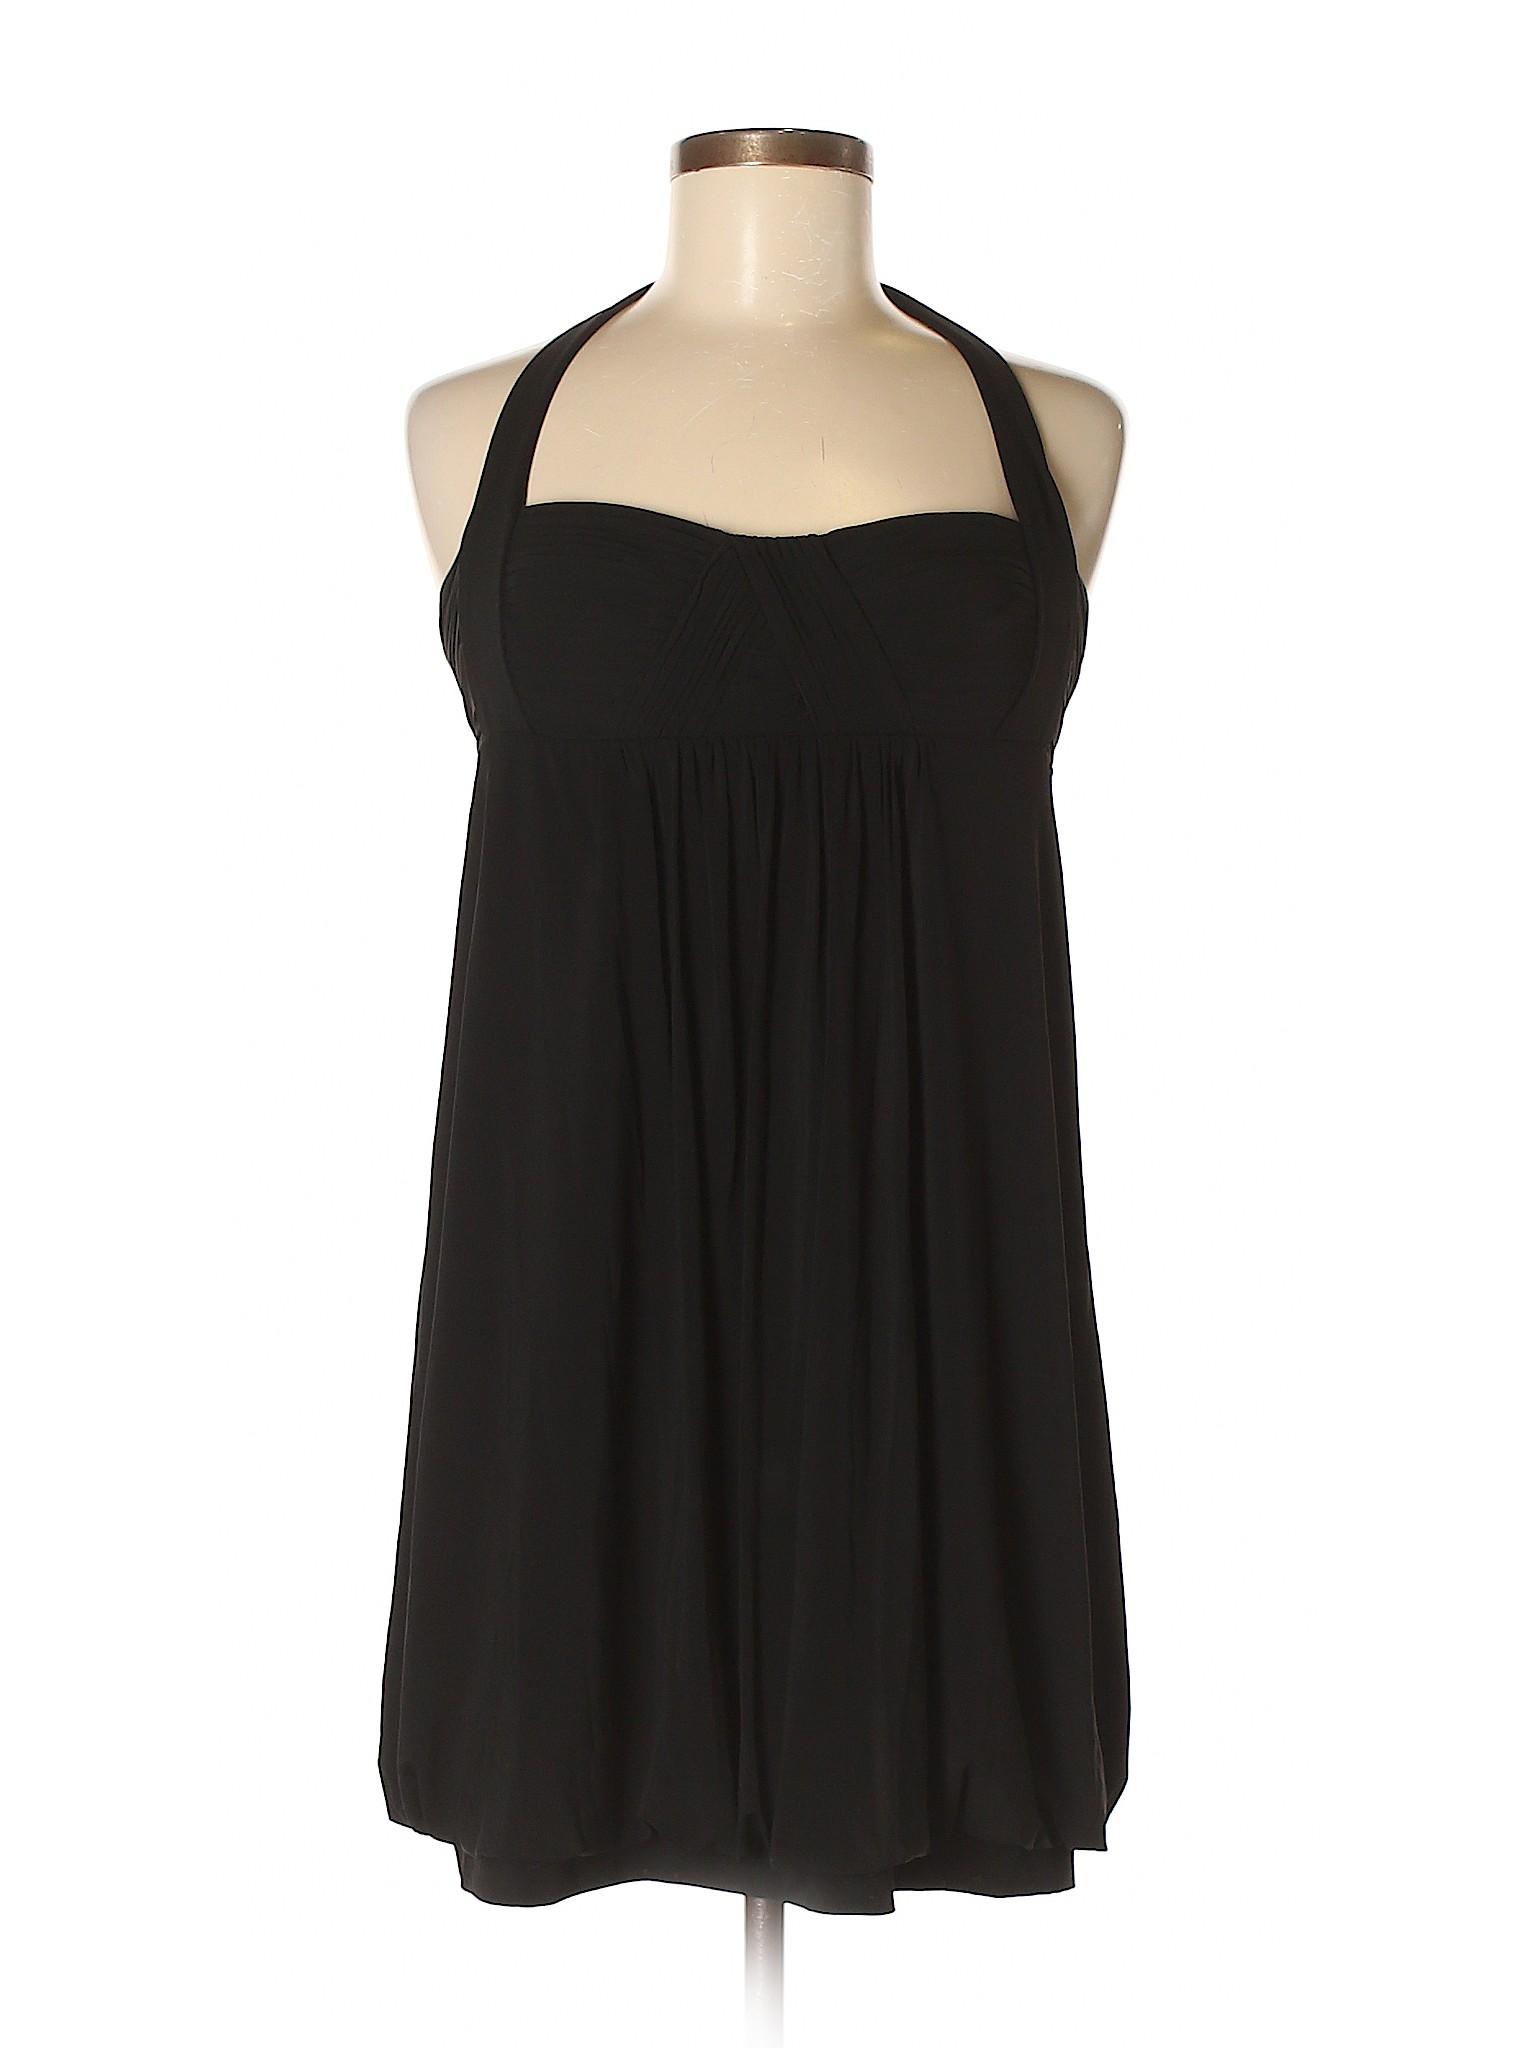 Dress Dress BCBGMAXAZRIA Casual Selling Selling Casual Selling BCBGMAXAZRIA 5qqanzP